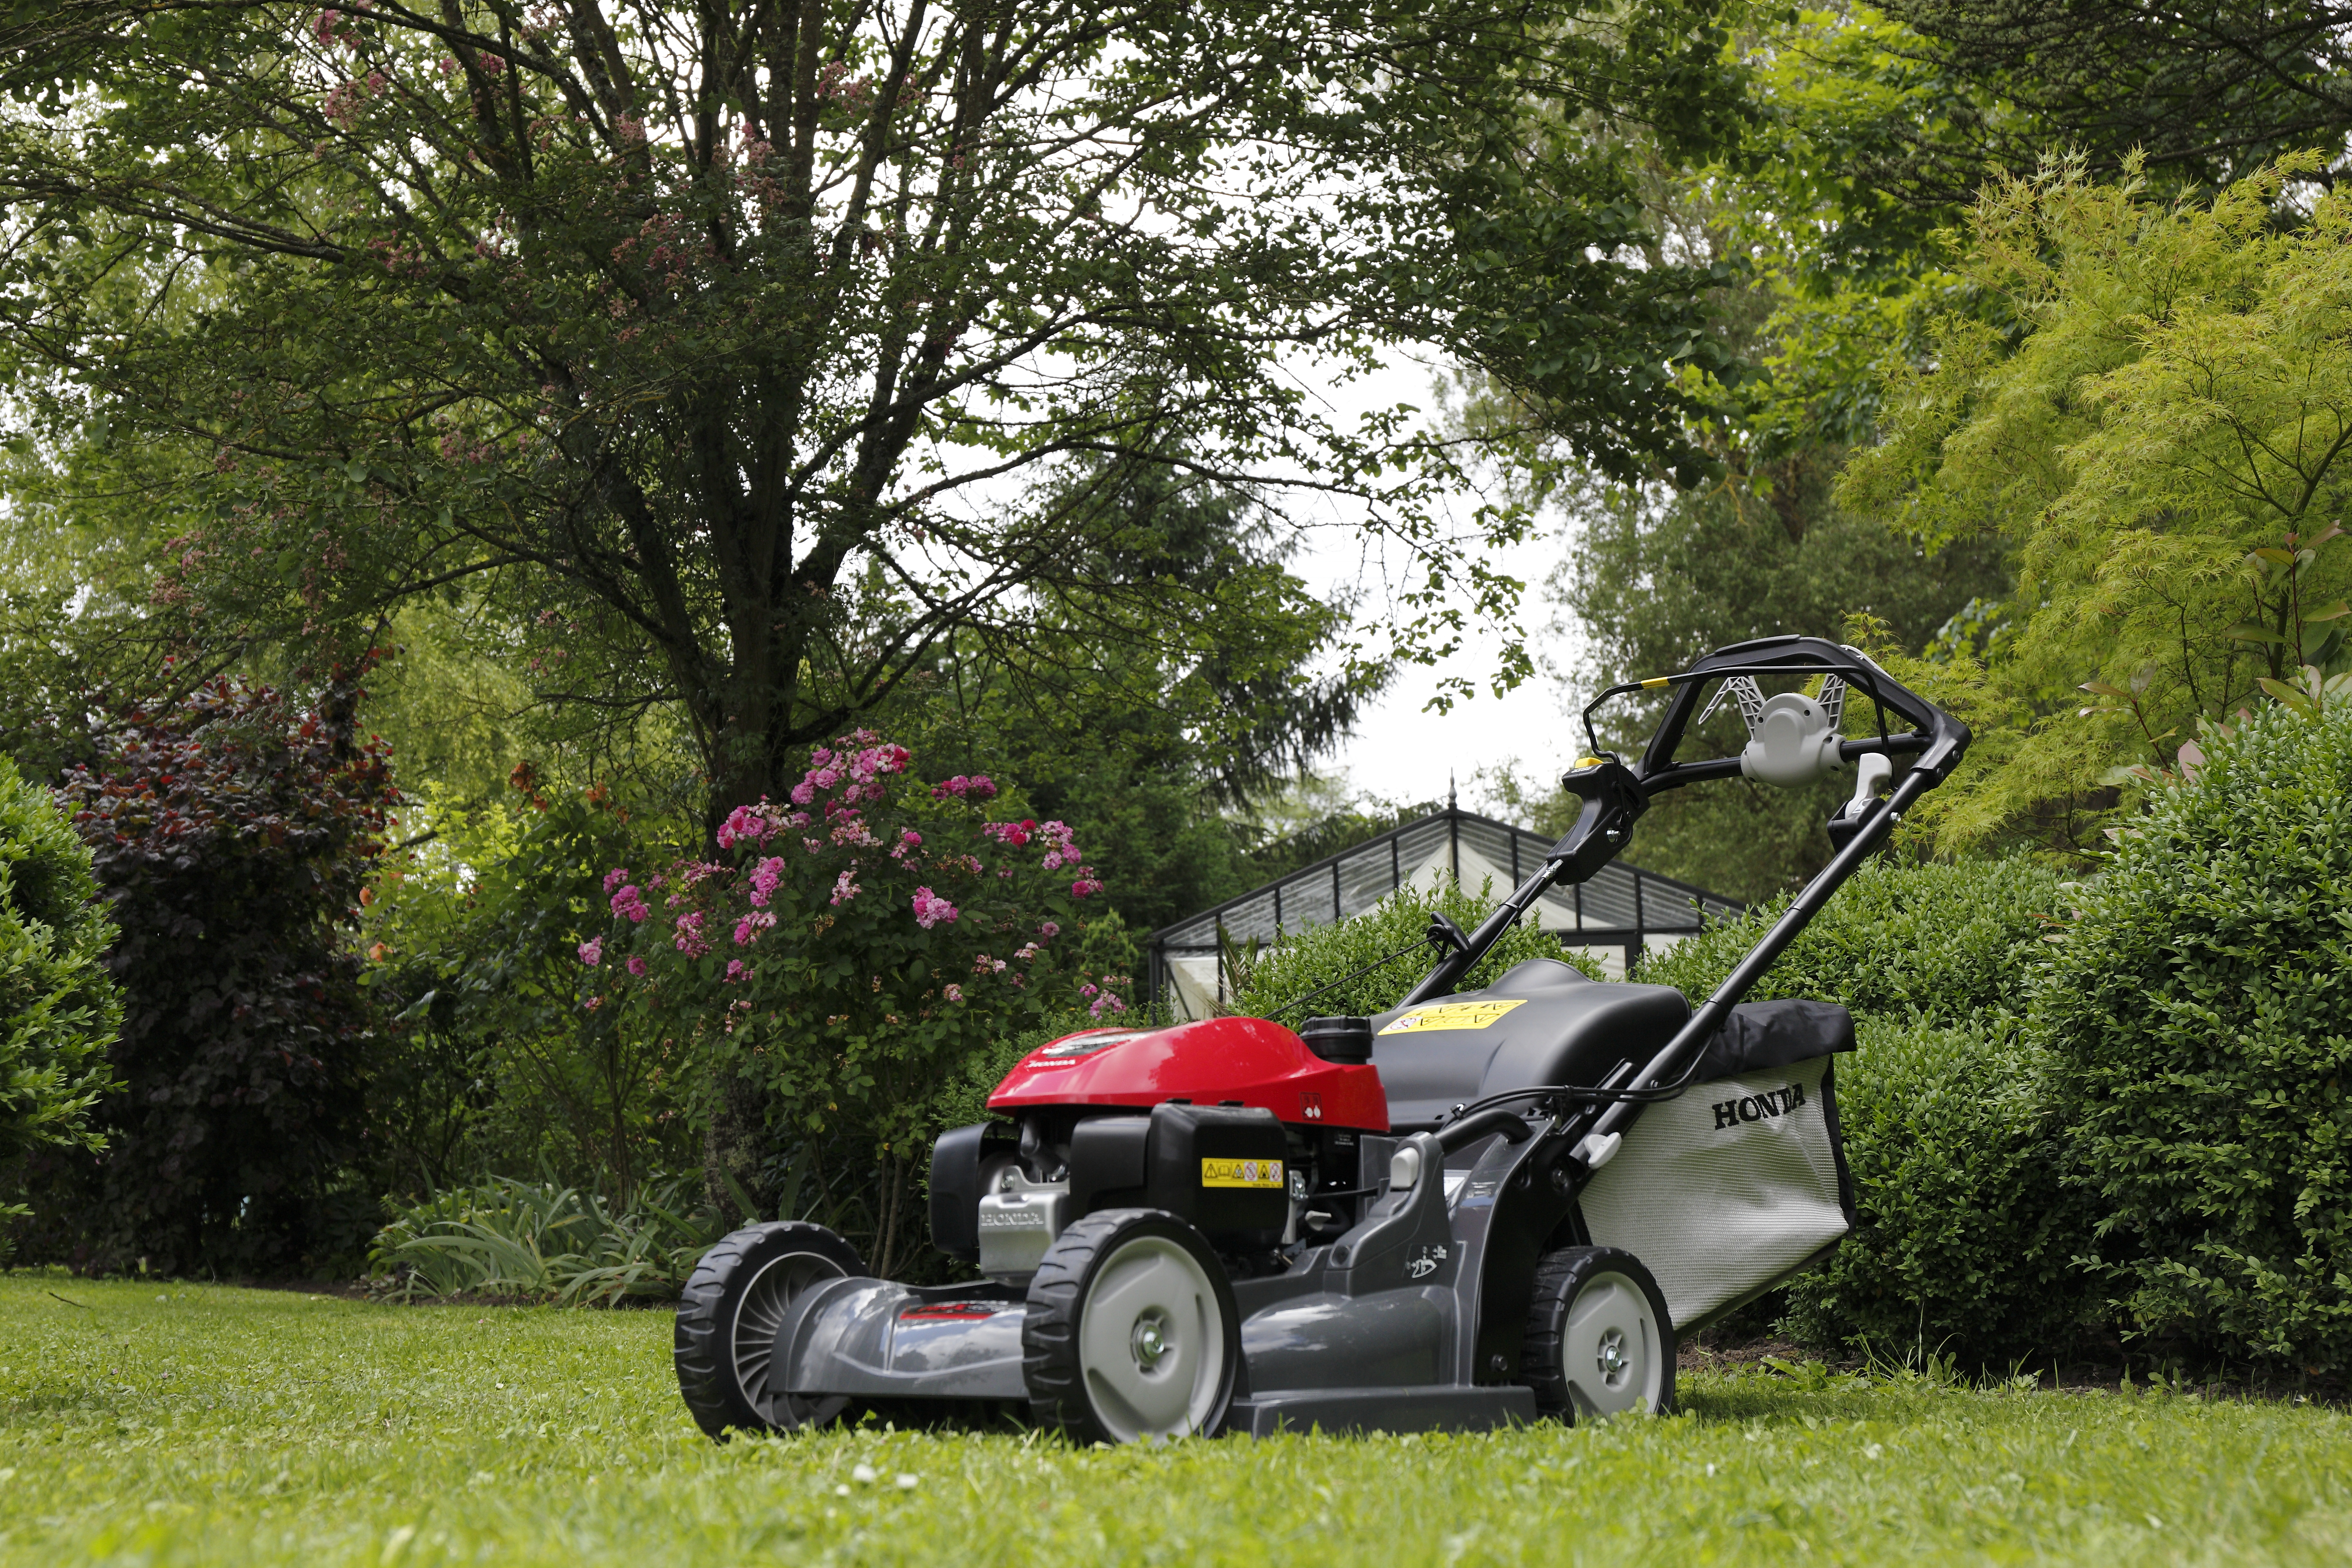 Tondeuse HRX 476 Honda Jardin